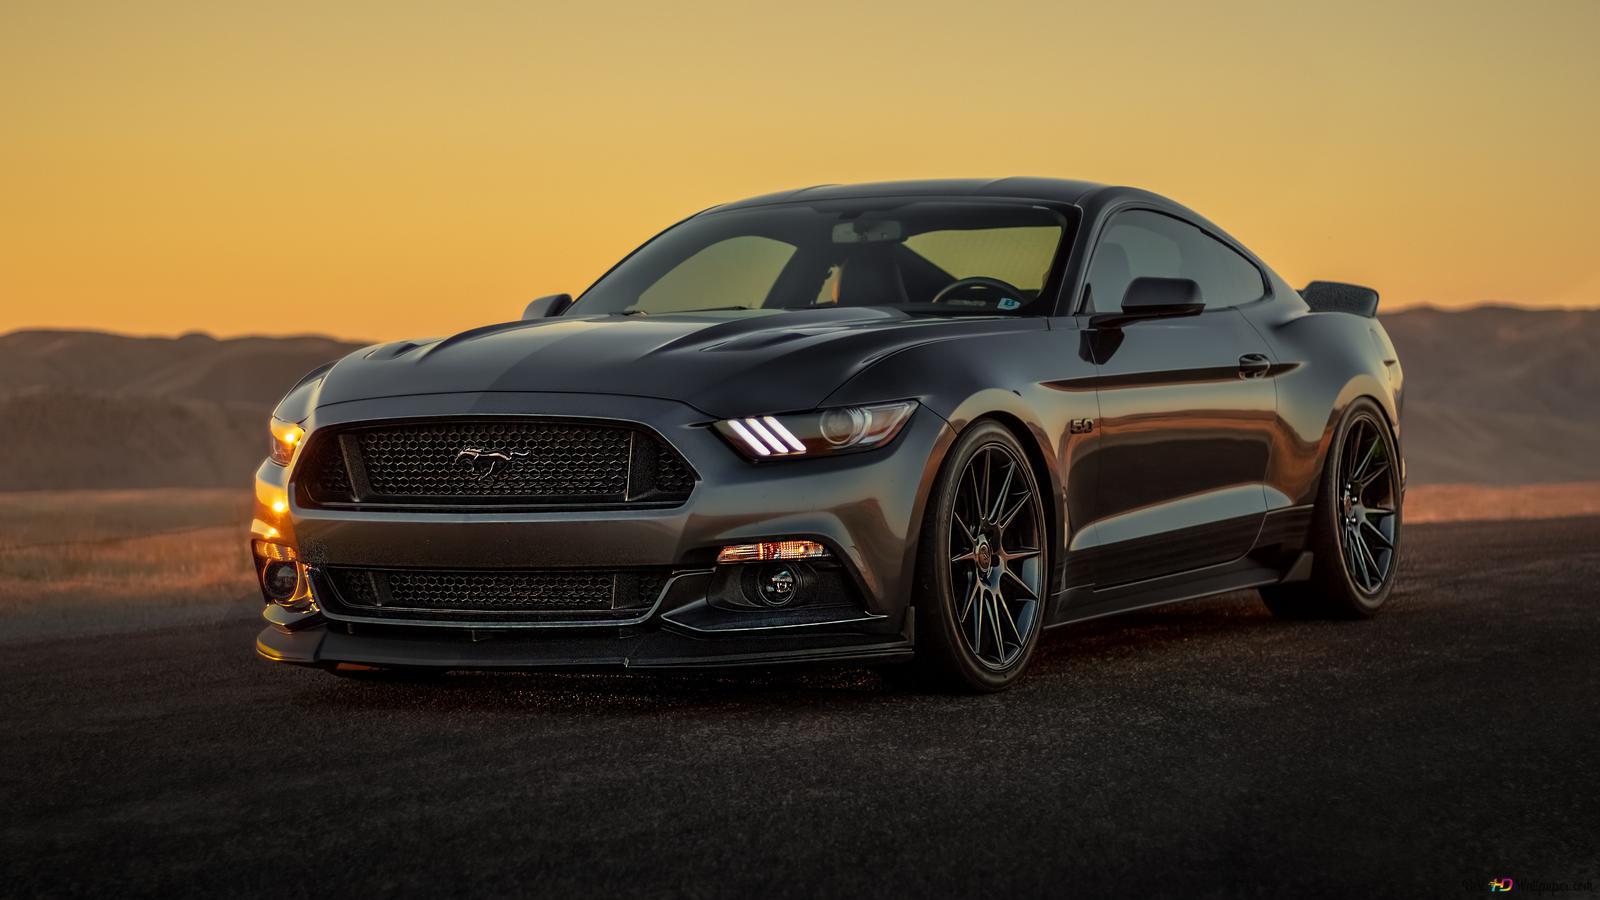 Preto Ford Mustang Carro Hd Wallpaper Download